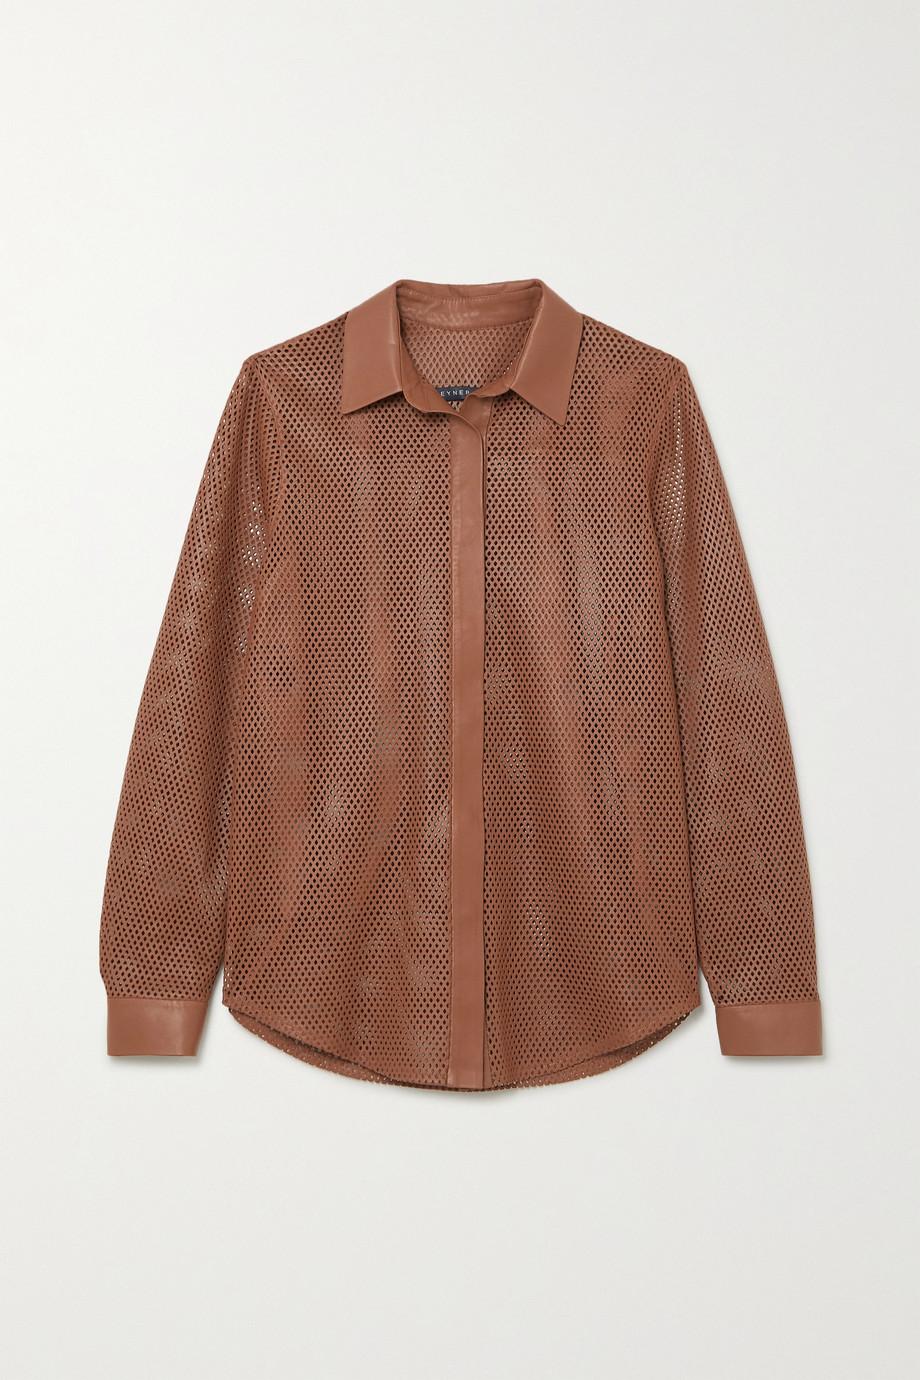 Zeynep Arcay Perforated leather shirt